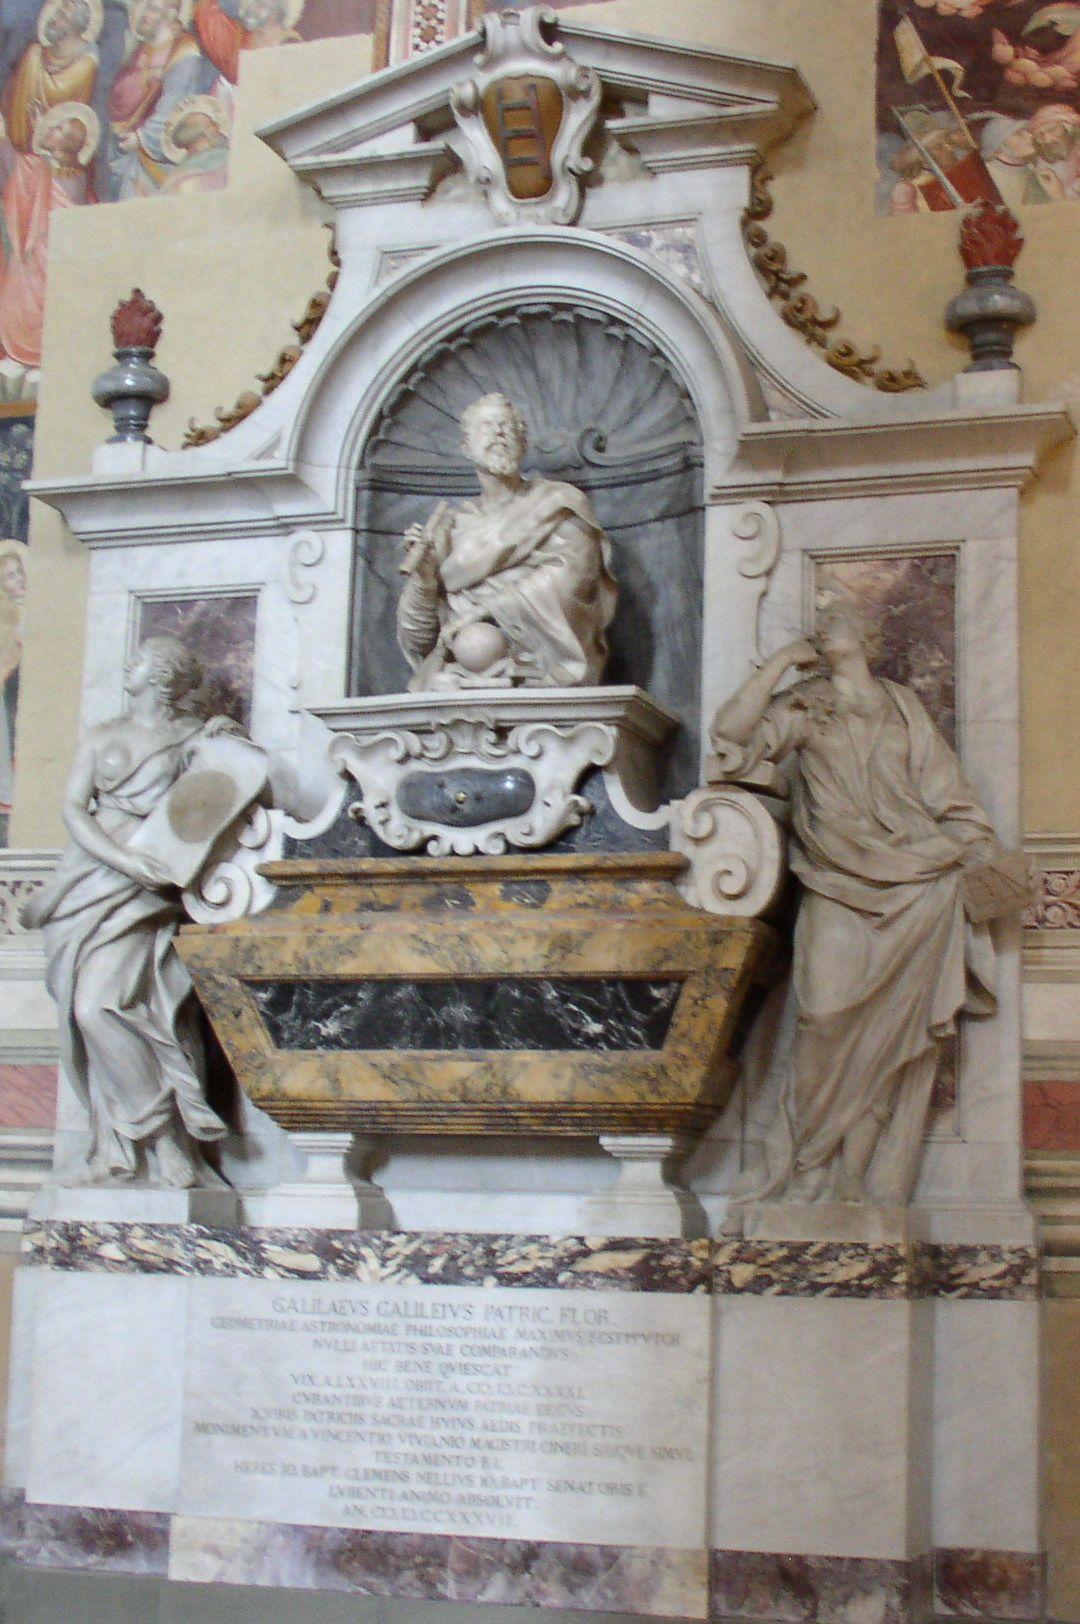 https://upload.wikimedia.org/wikipedia/commons/7/79/Galileo_grave.jpg